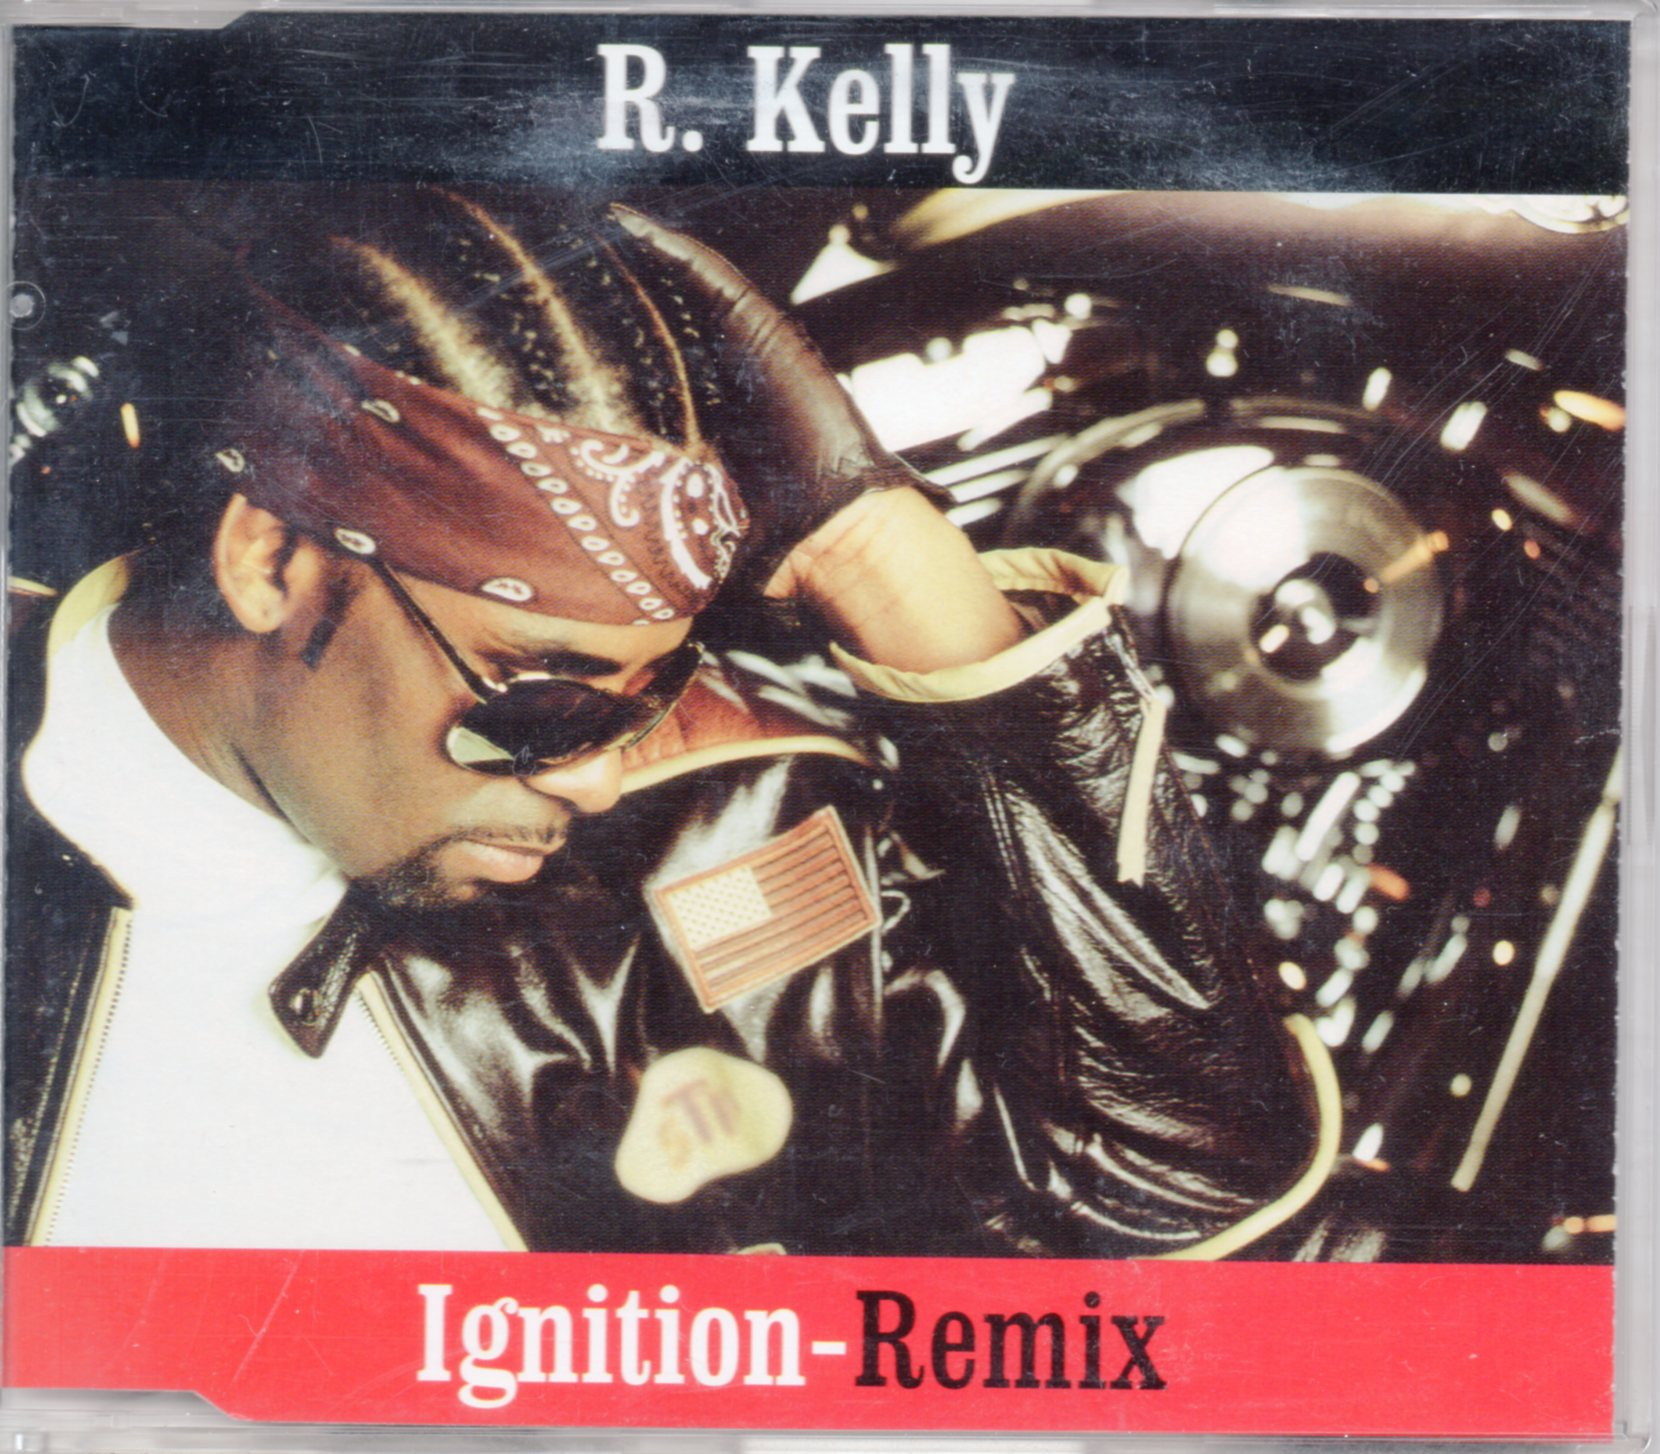 R. KELLY - Ignition Remix PROMO 2-track Jewel case - CD Maxi